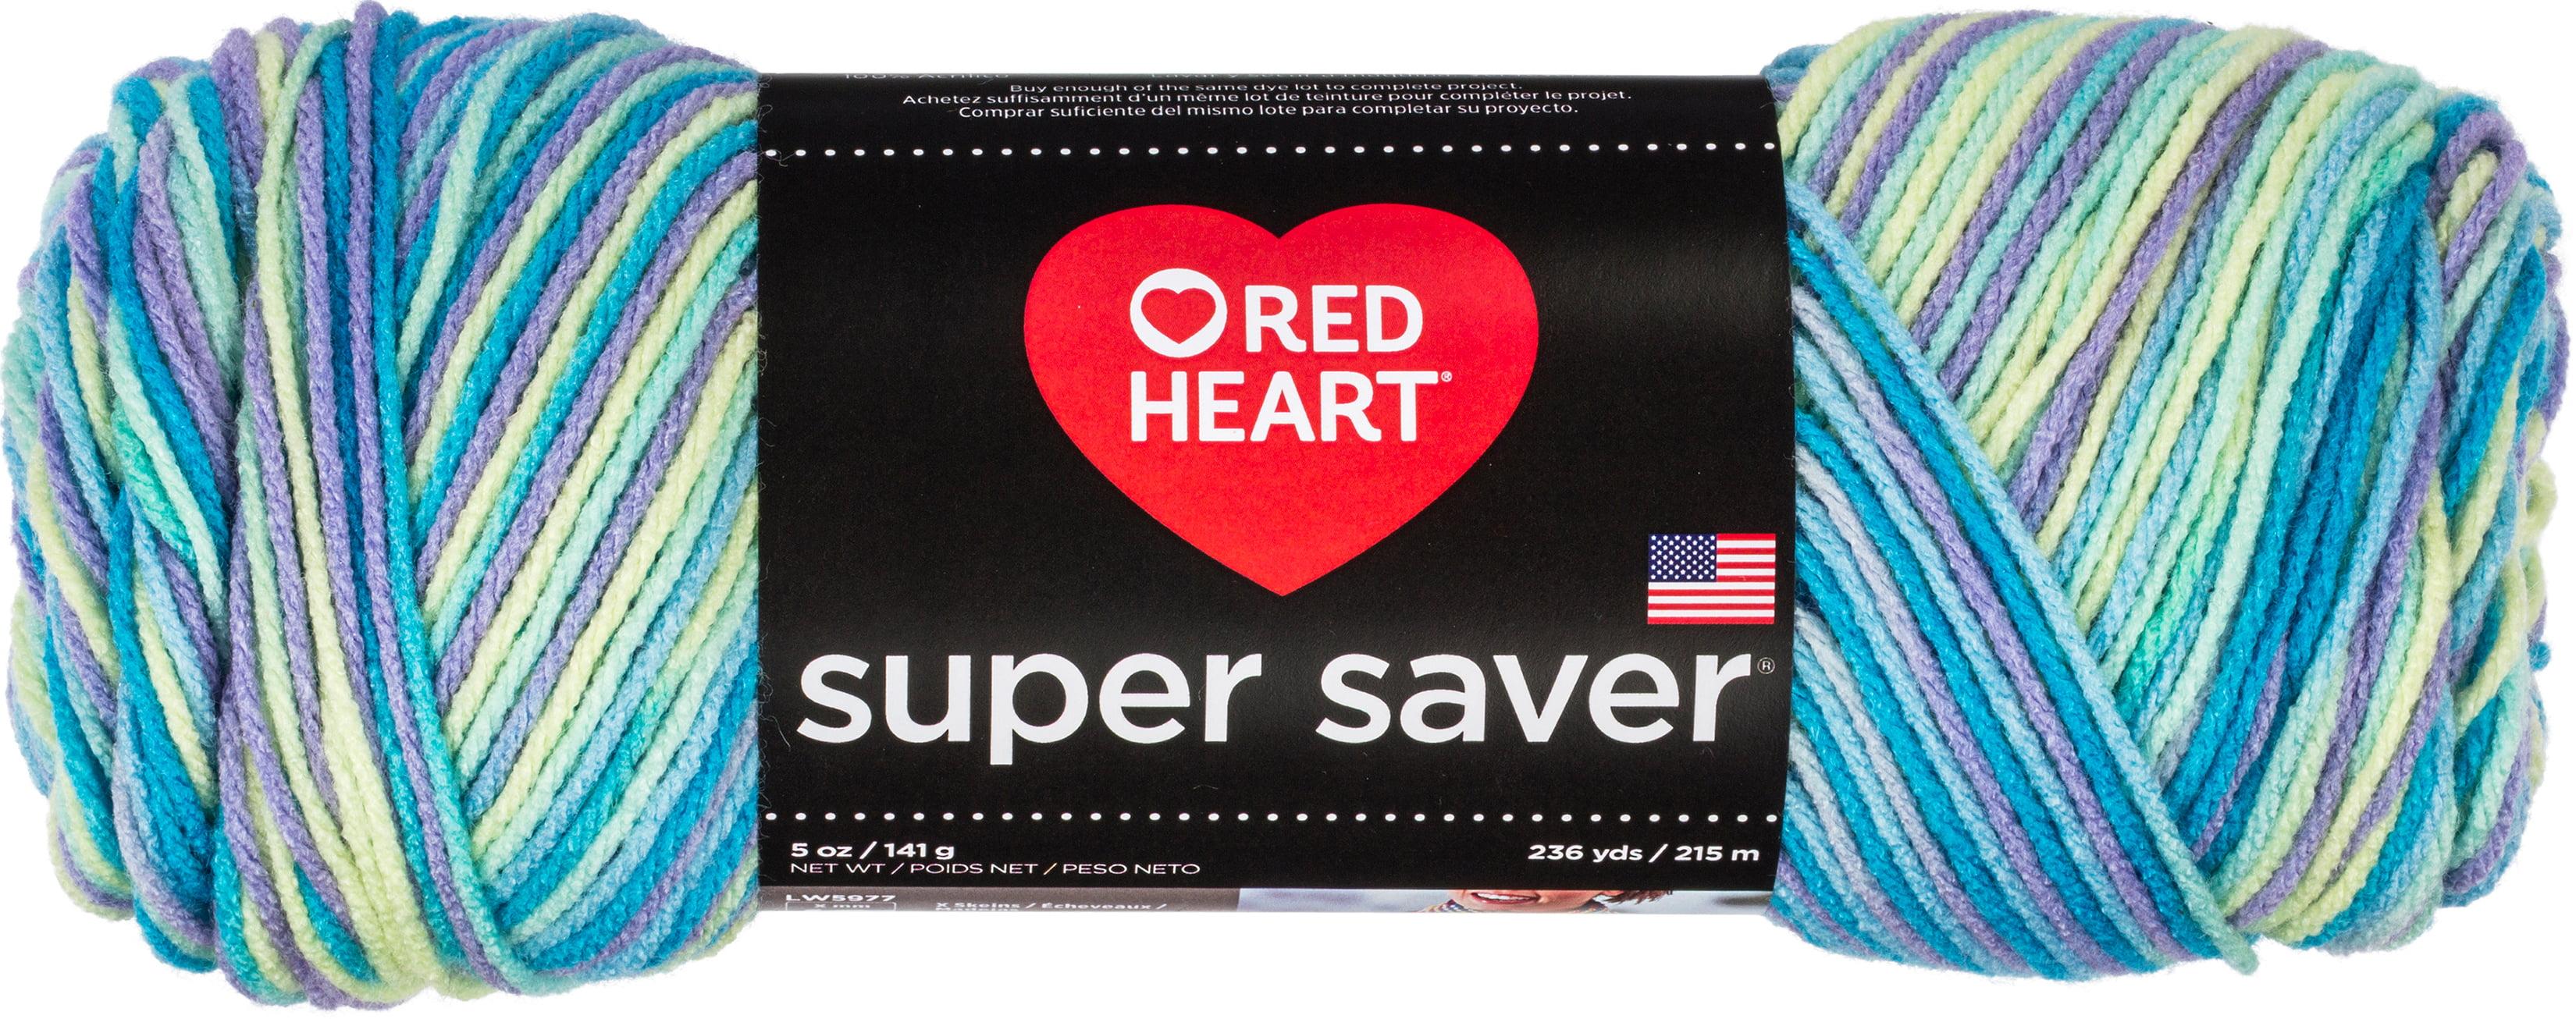 3 Pack Red Heart Super Saver Pooling Yarn-Stillwater